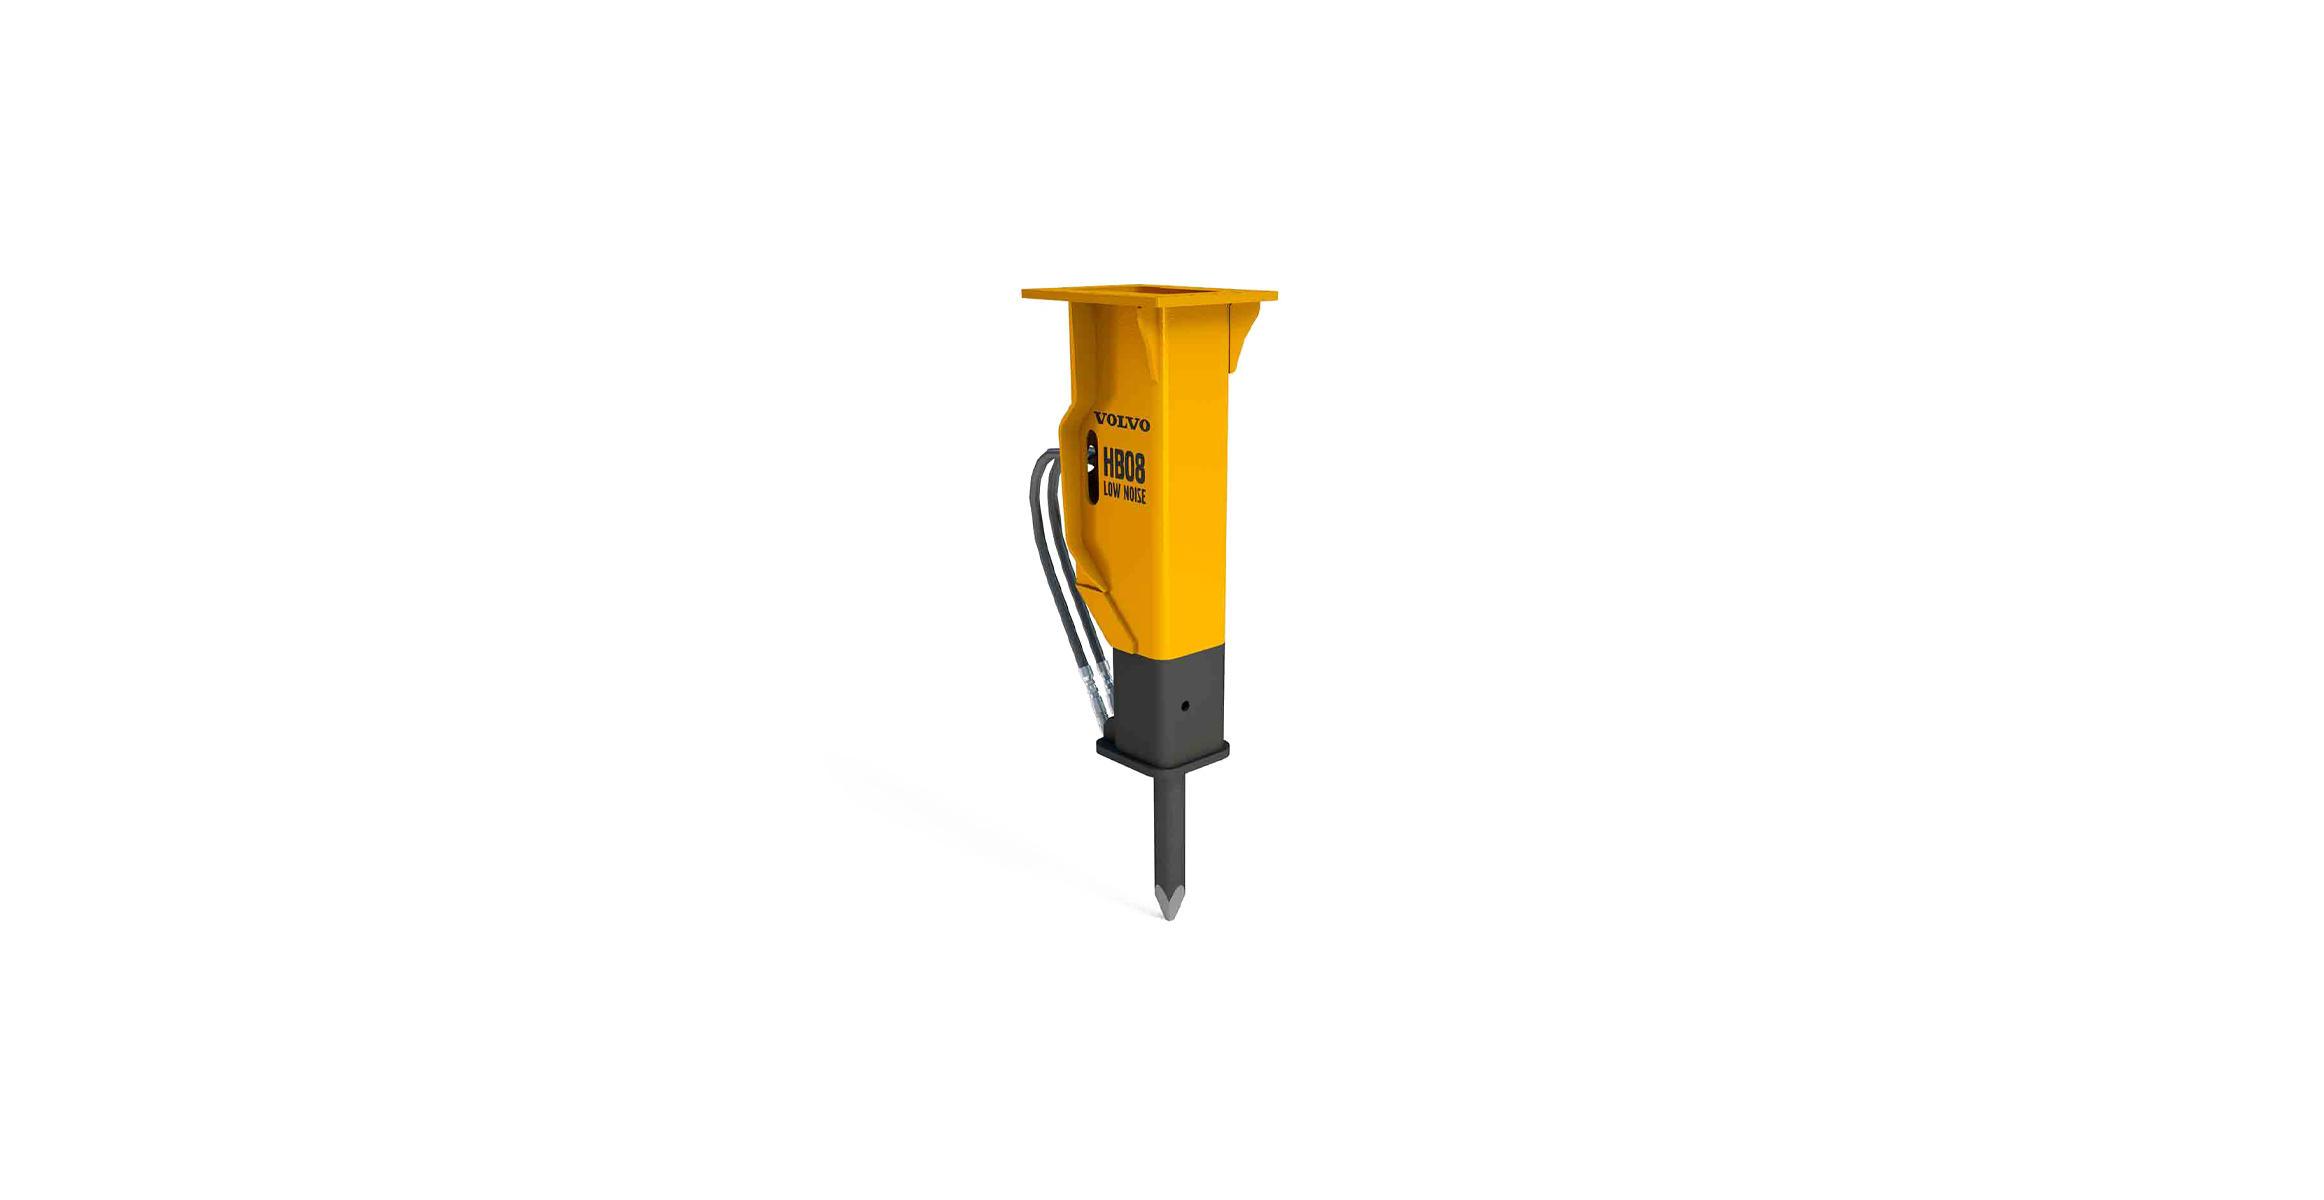 Hydraulic breakers | HB08 Low Noise